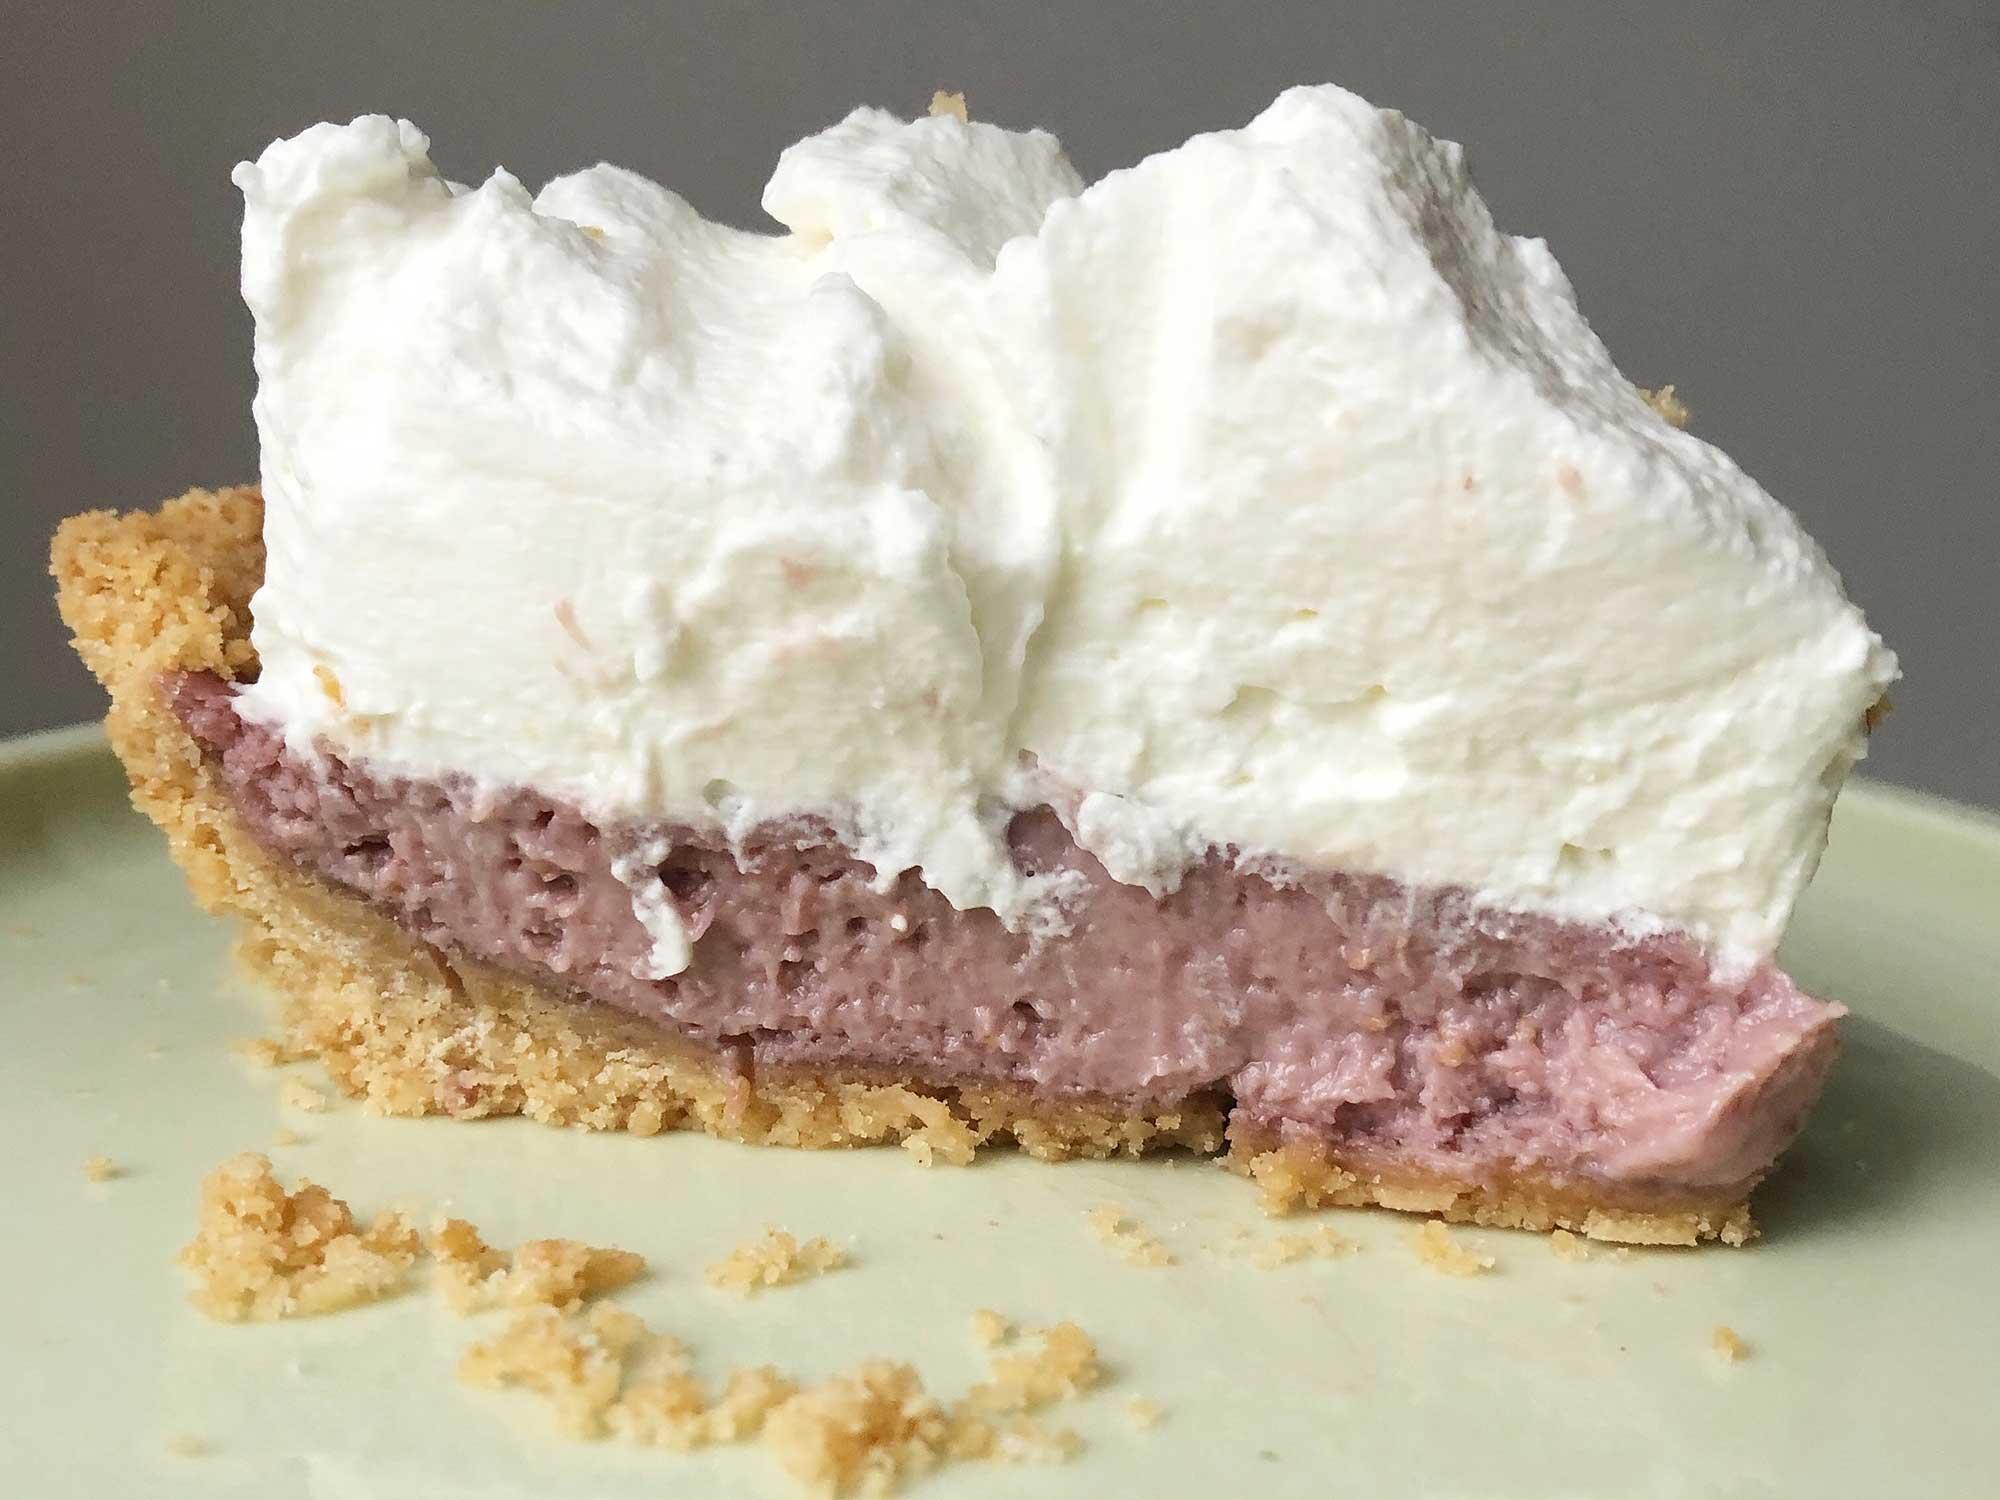 Rhubarb-Lime Icebox Pie